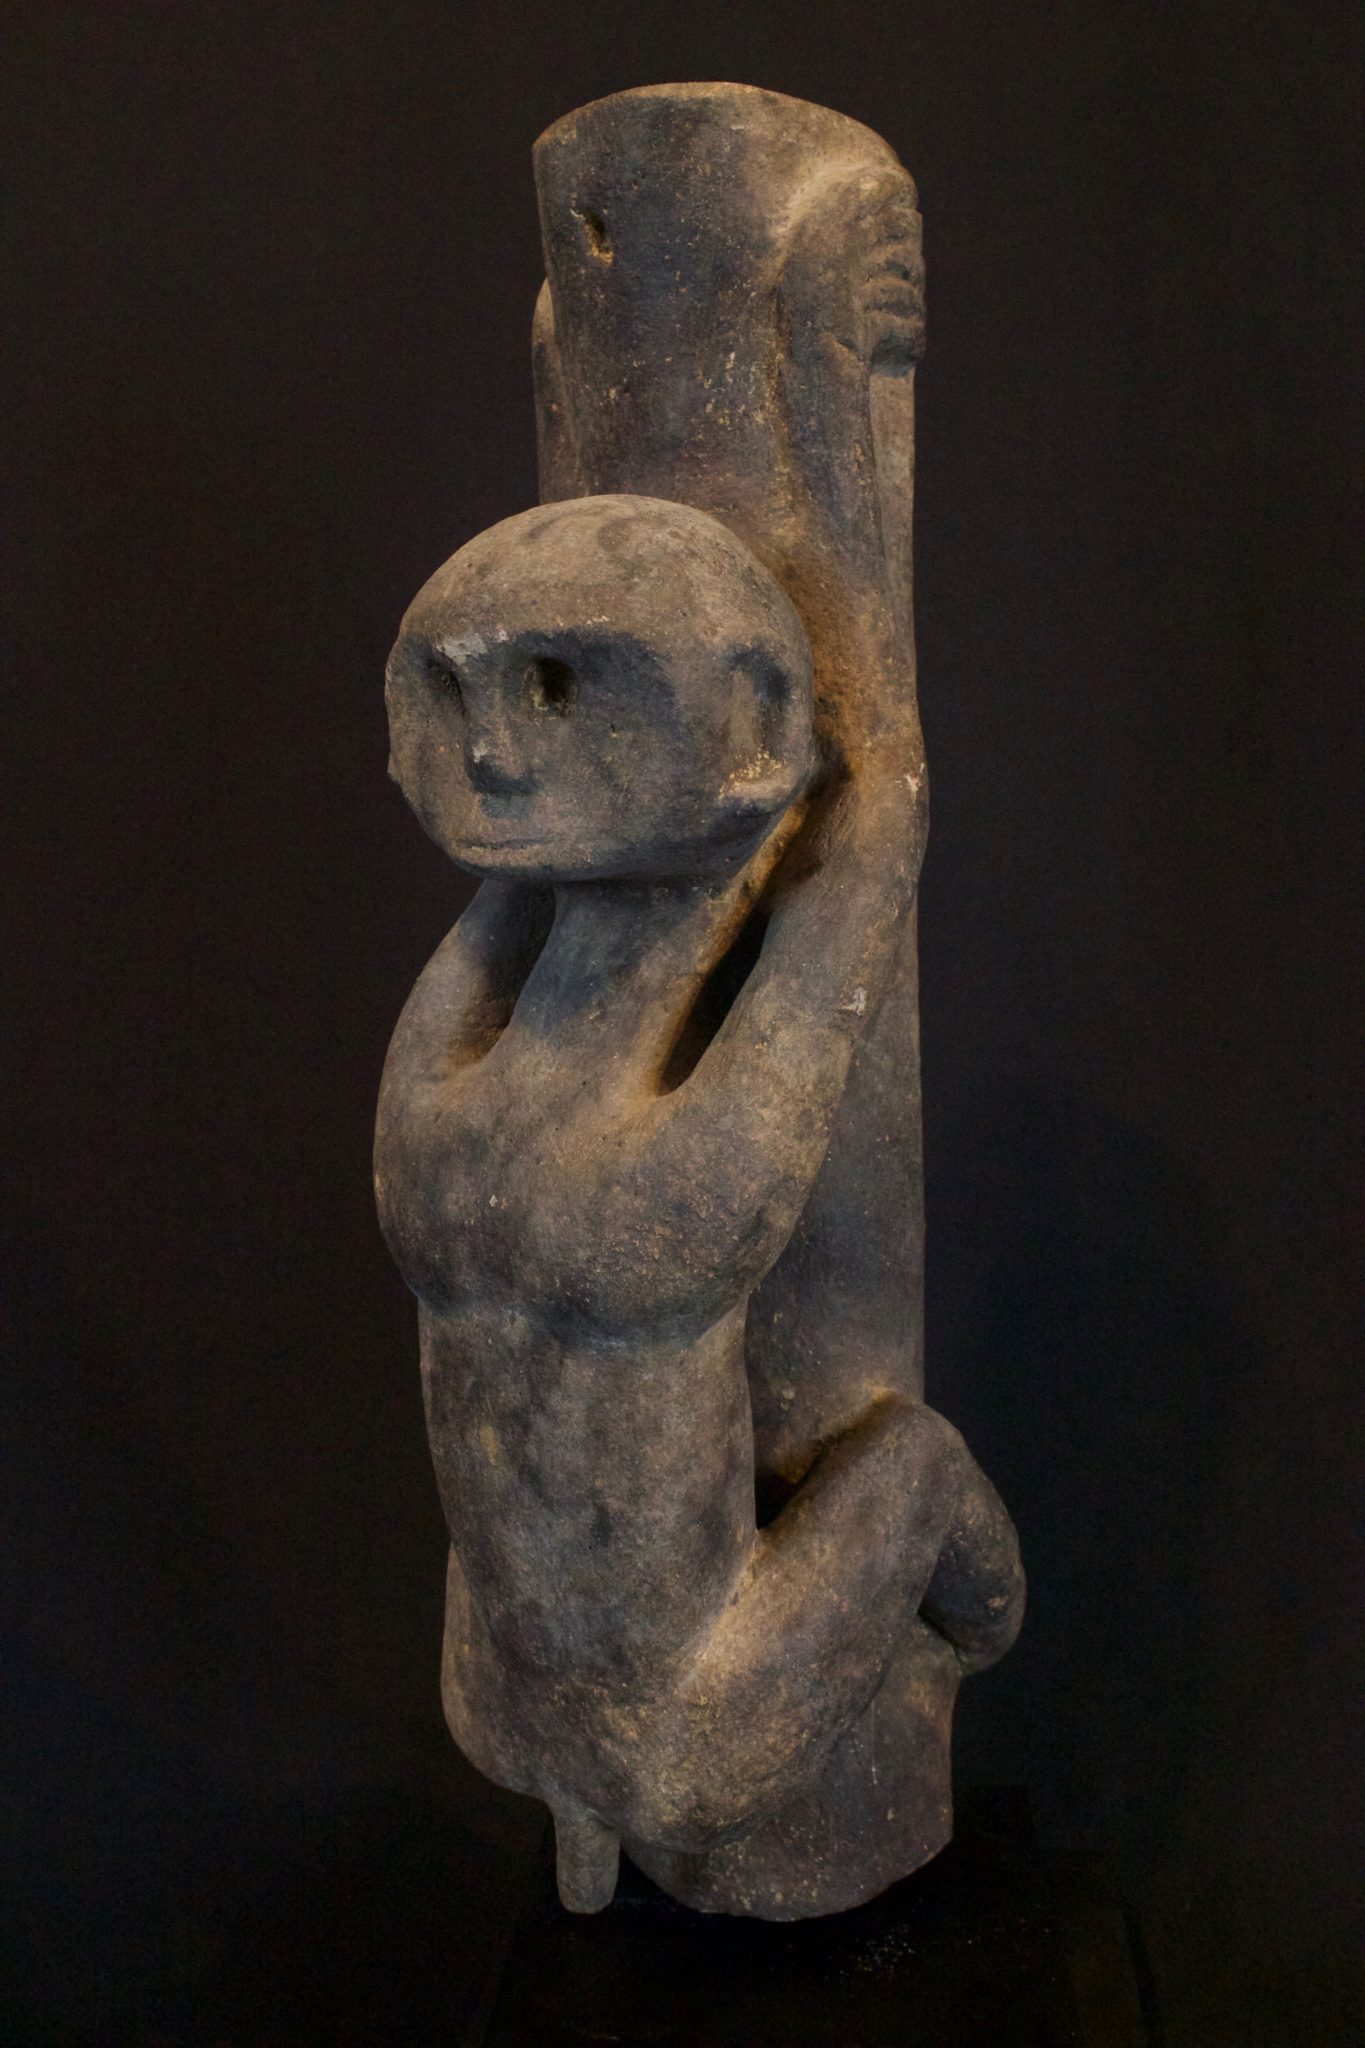 "God Effigy (rare), Mentawai Islands, Sumatra, Indonesia, Mentawai tribe, 19th c, Wood. Used as a symbol to pray to. 15 ½"" x 3 ½"" x 6"", $1600."